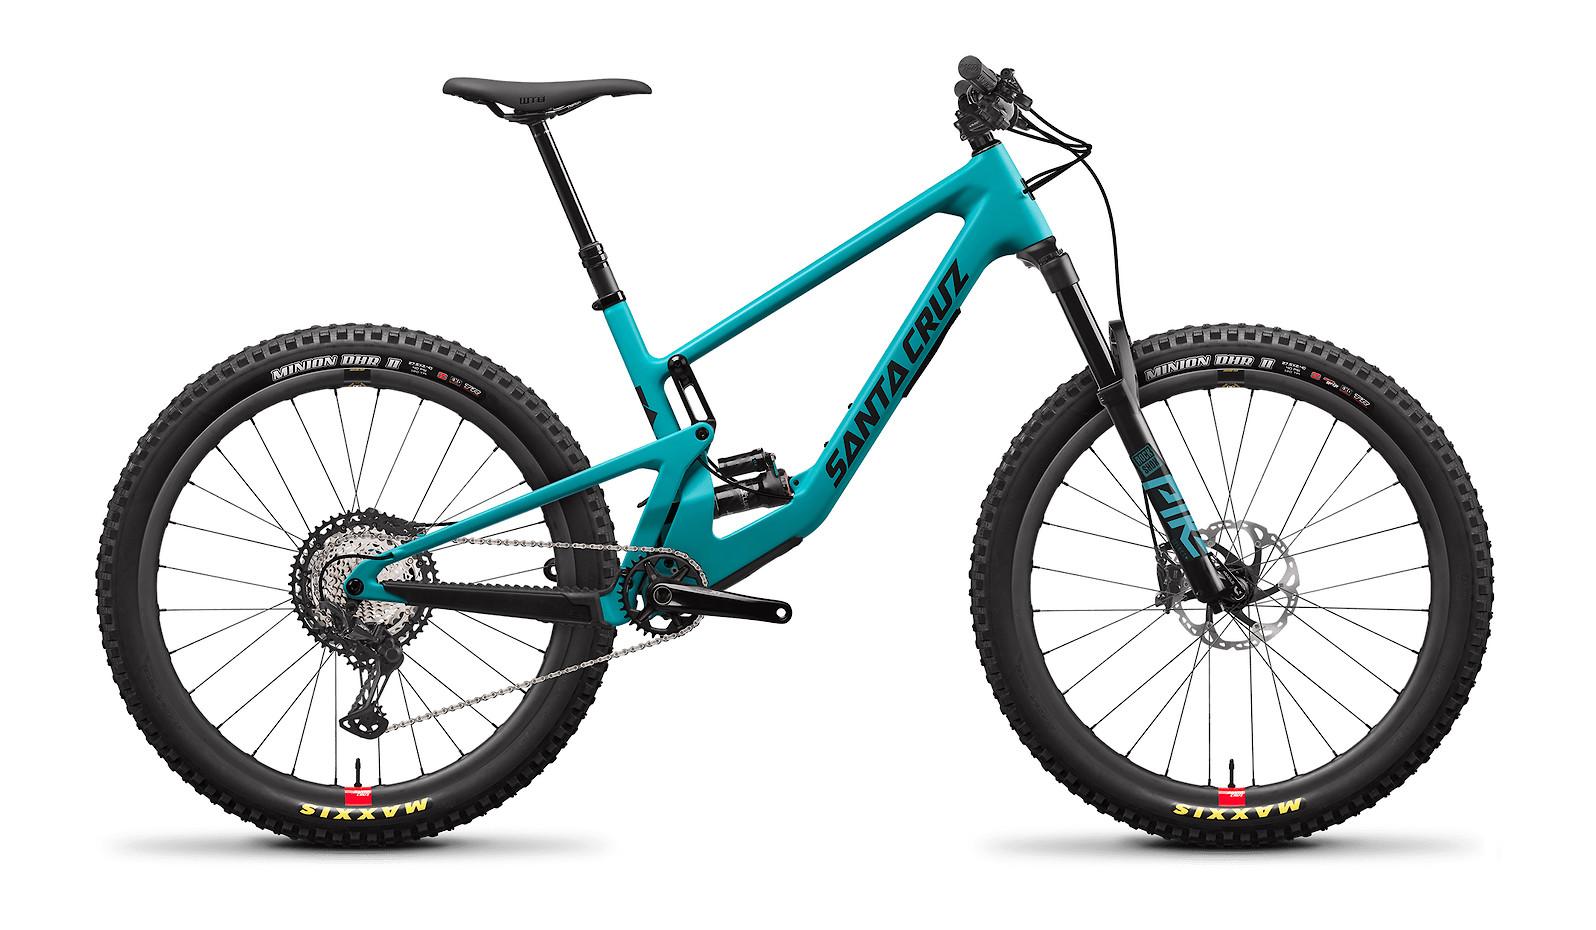 2021 Santa Cruz 5010 Carbon C XT (Loosely Blue and Black, with Santa Cruz Reserve Carbon rims)